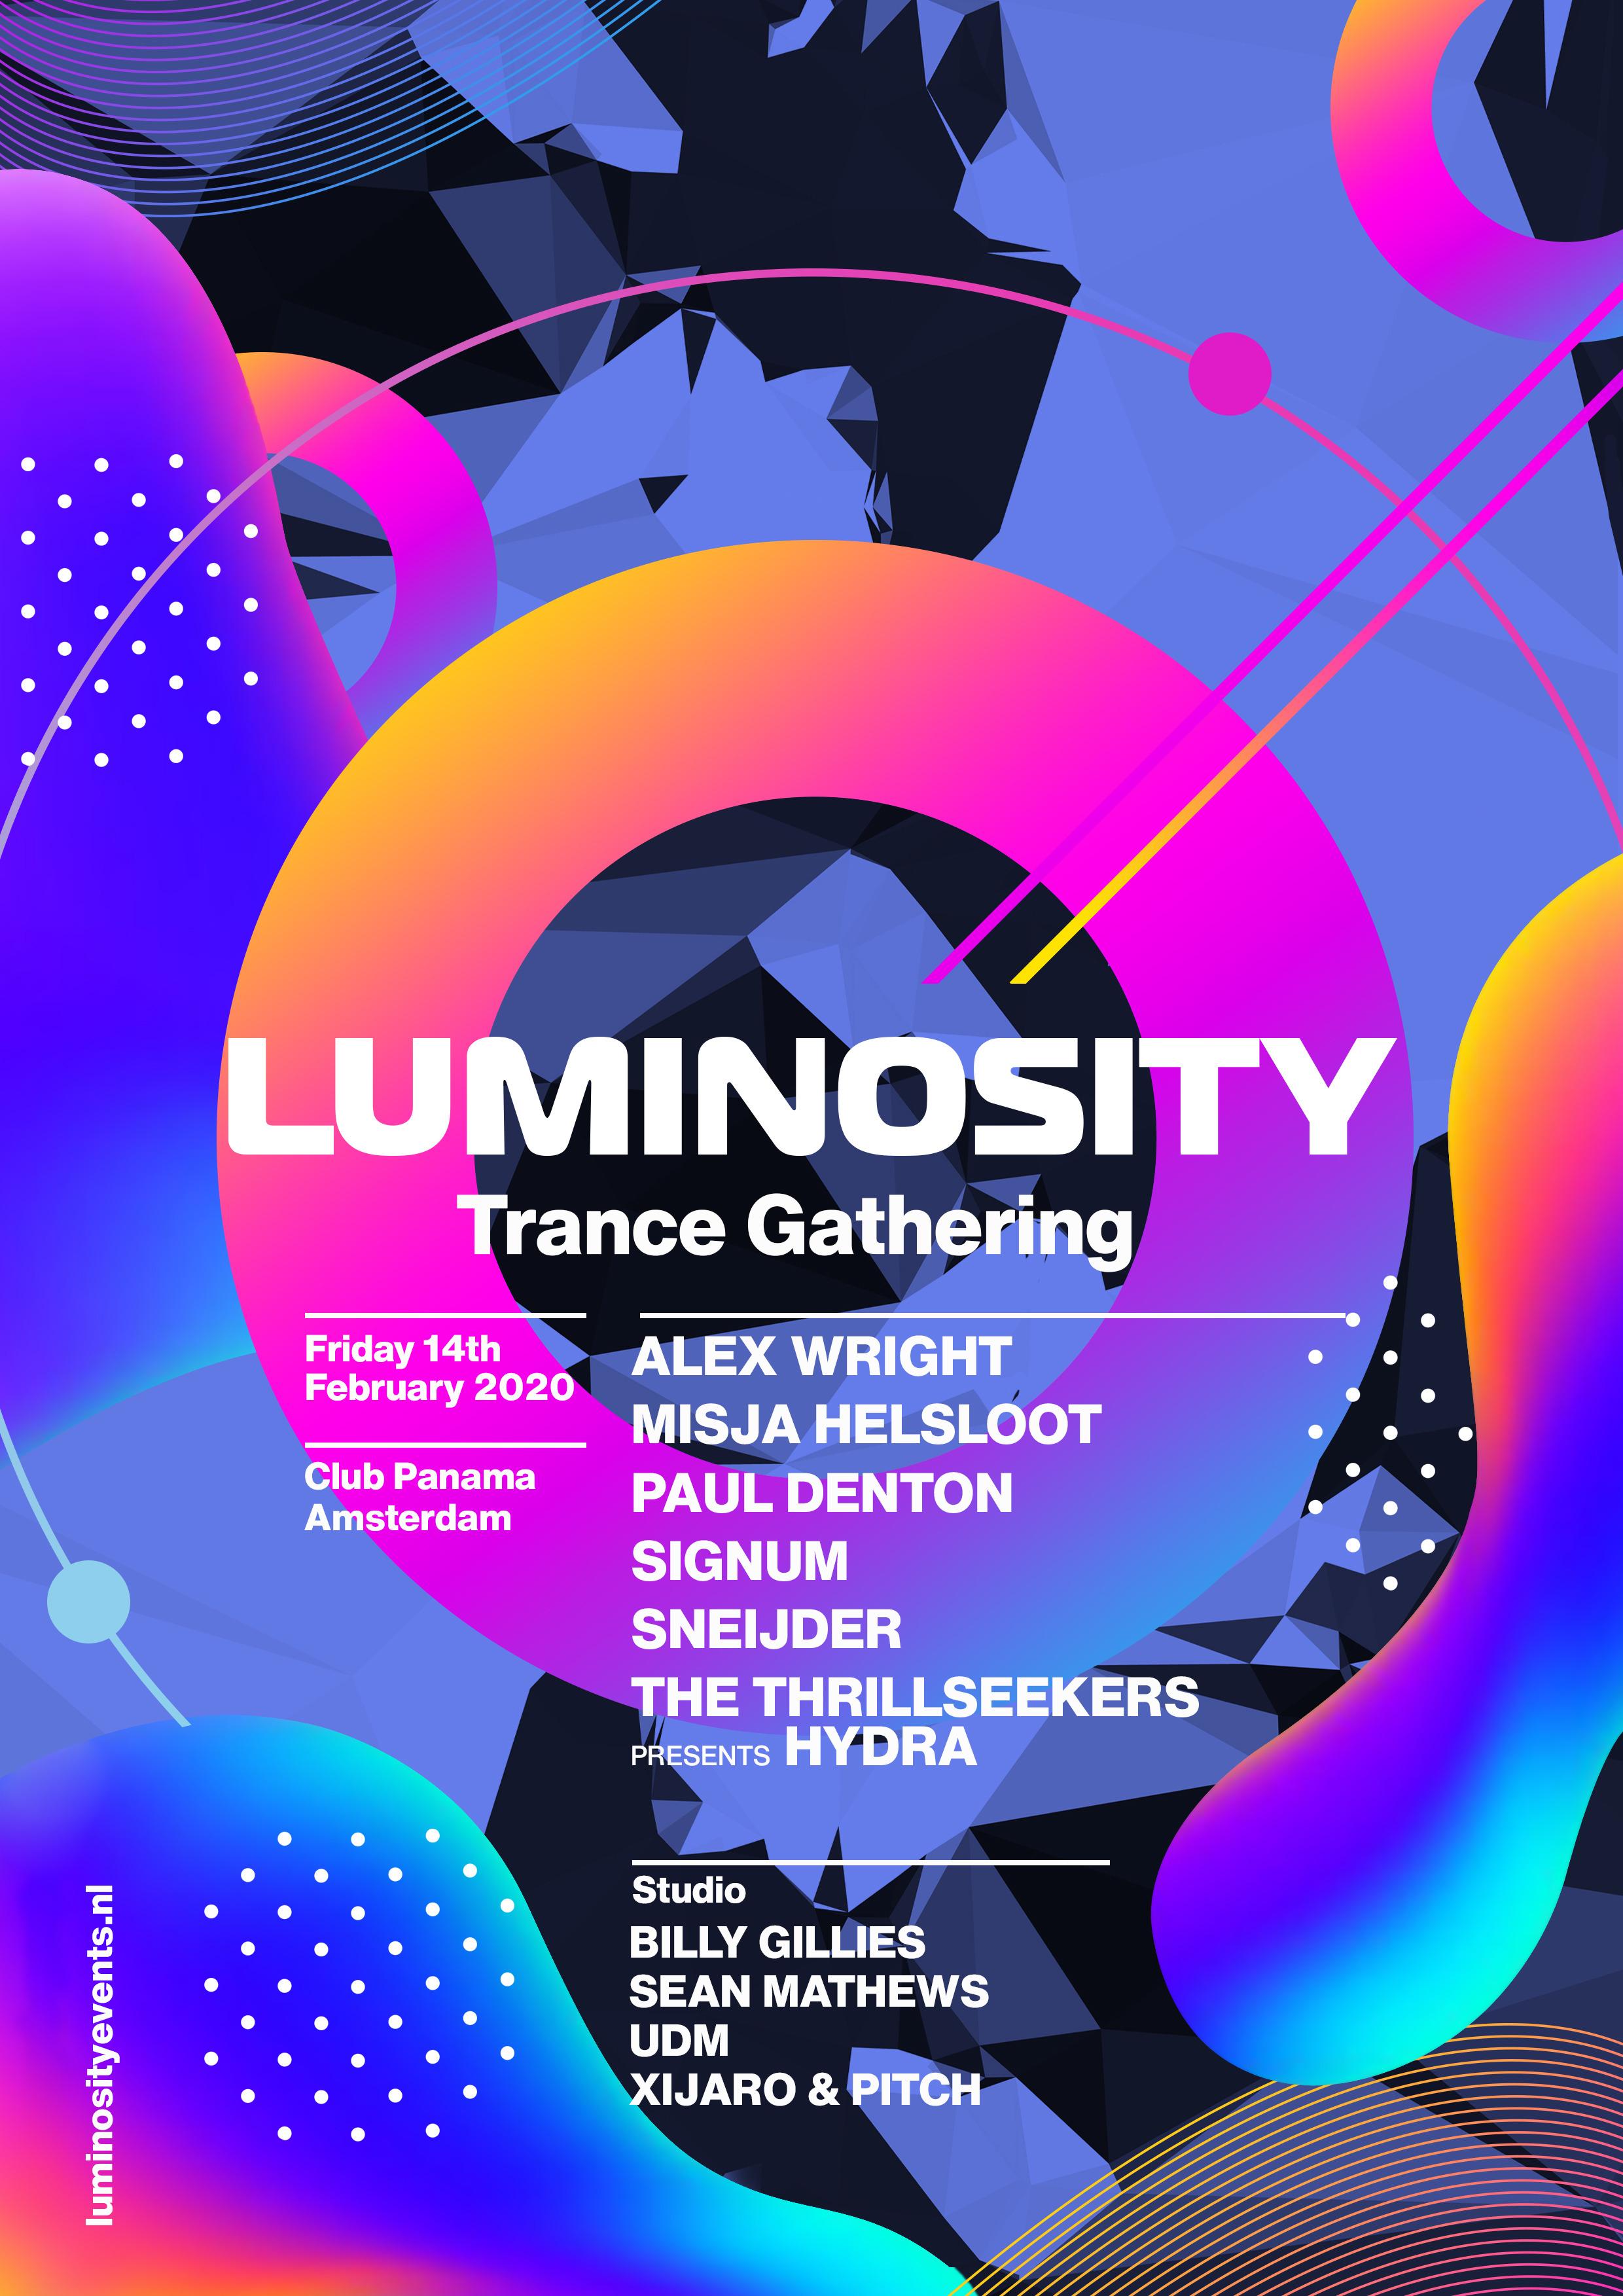 La Events February 2020.Luminosity Trance Gathering 2020 Luminosity Events